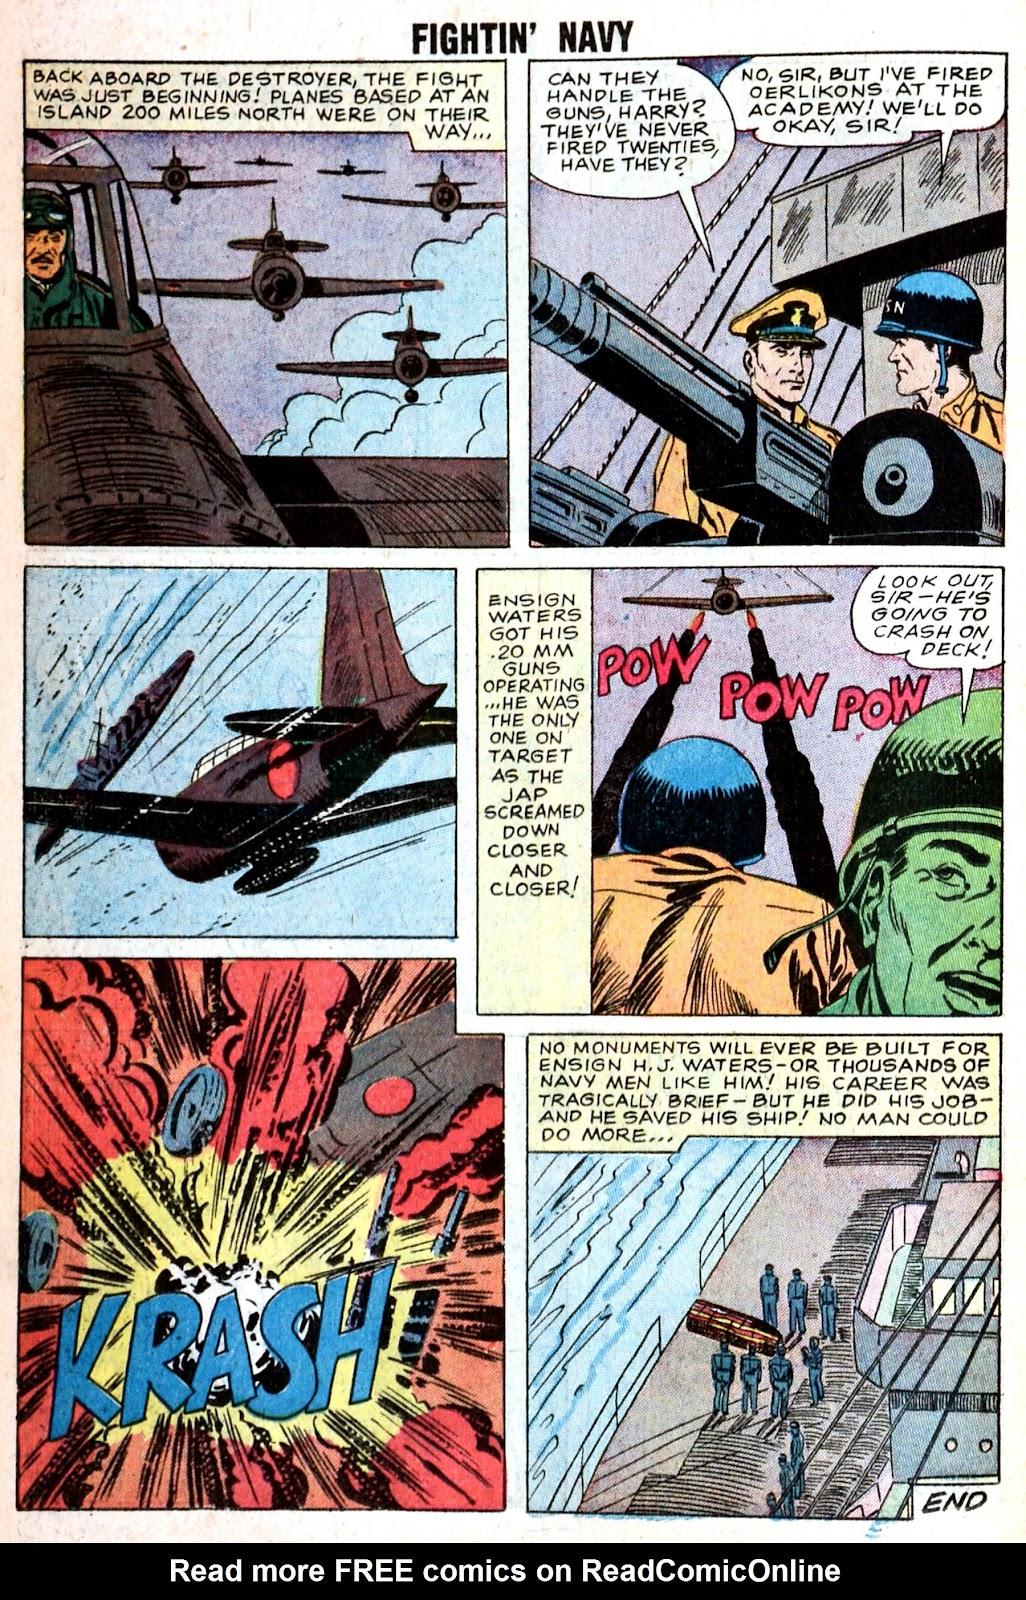 Read online Fightin' Navy comic -  Issue #85 - 18